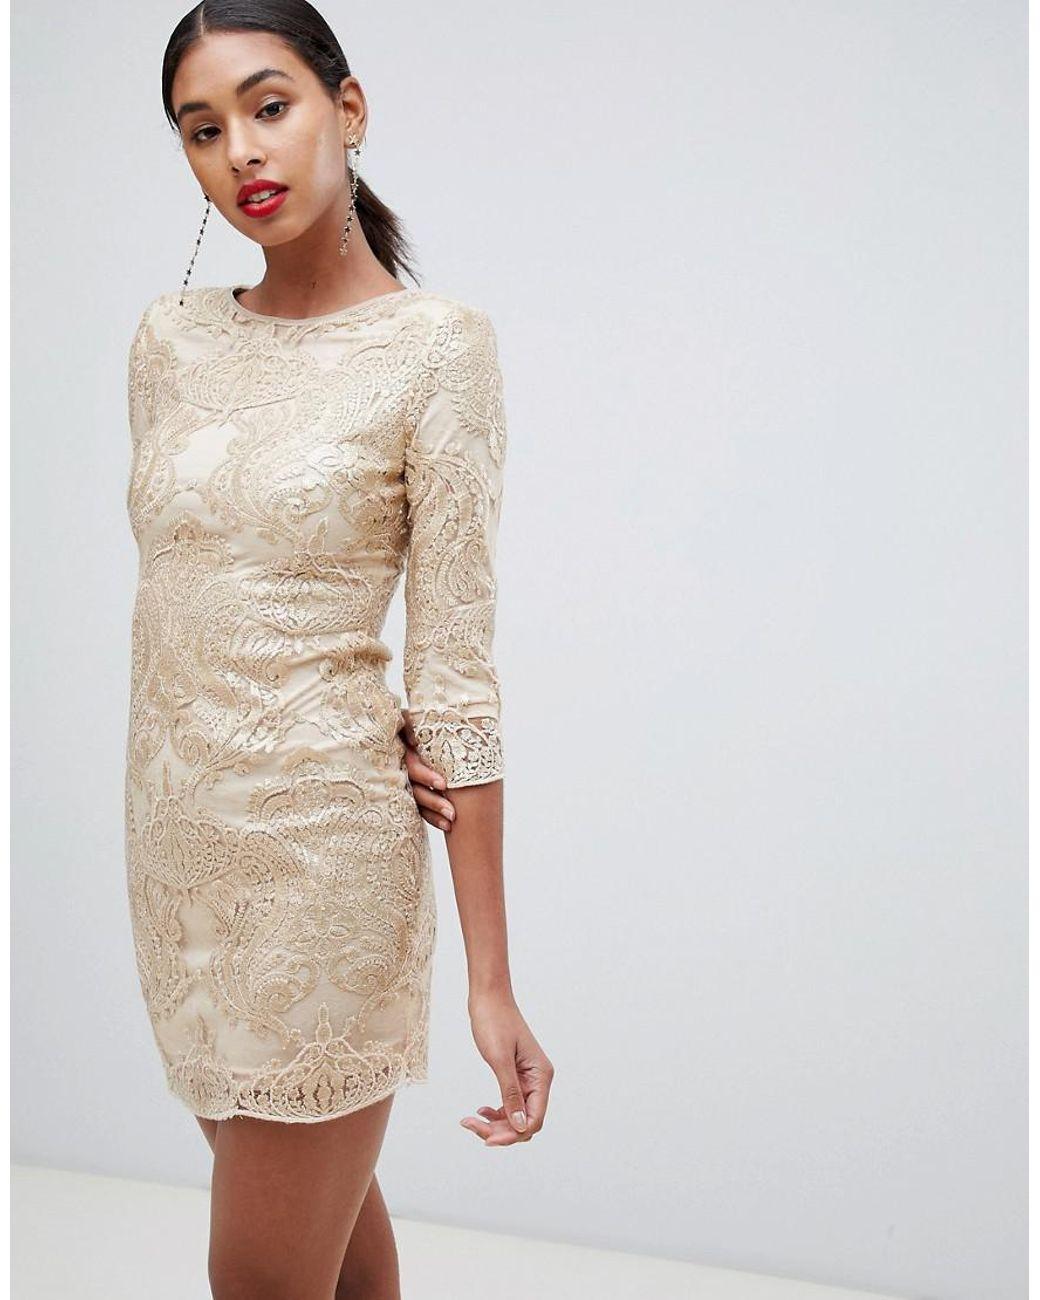 e1796f984e455 TFNC London Baroque Patterned Sequin Mini Dress In Gold in Metallic - Lyst